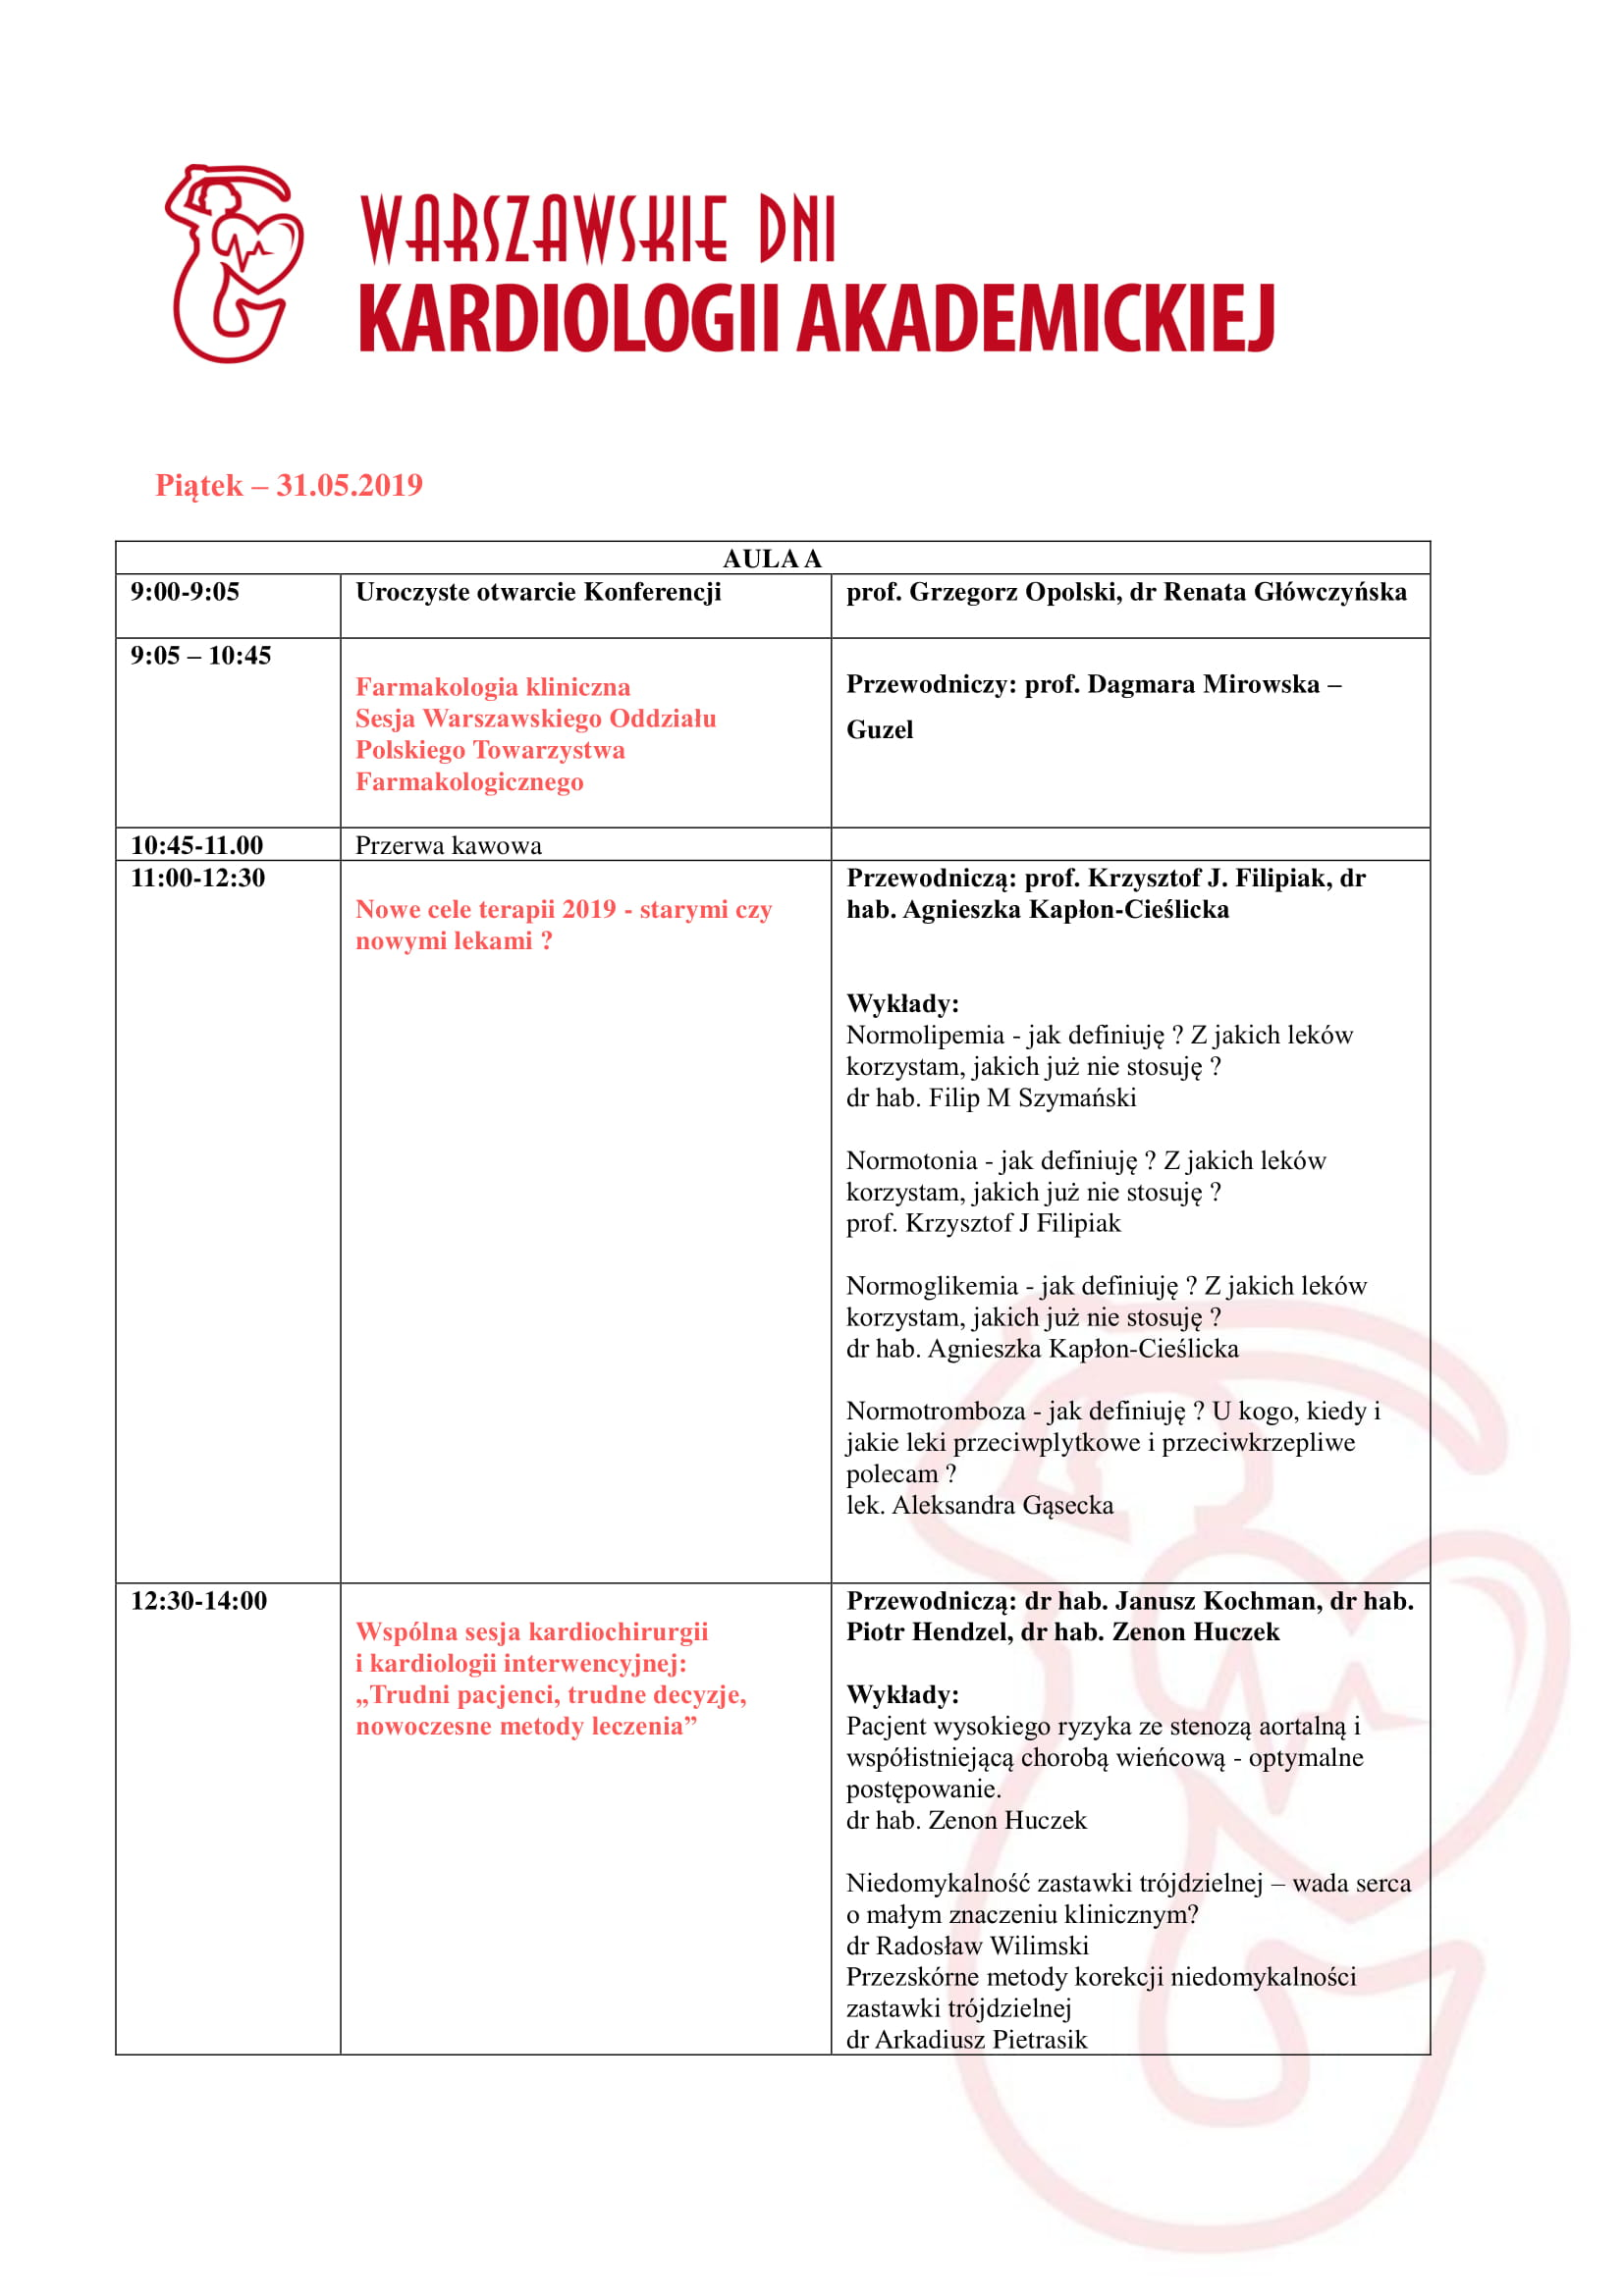 WDKA2019-program-2019-1